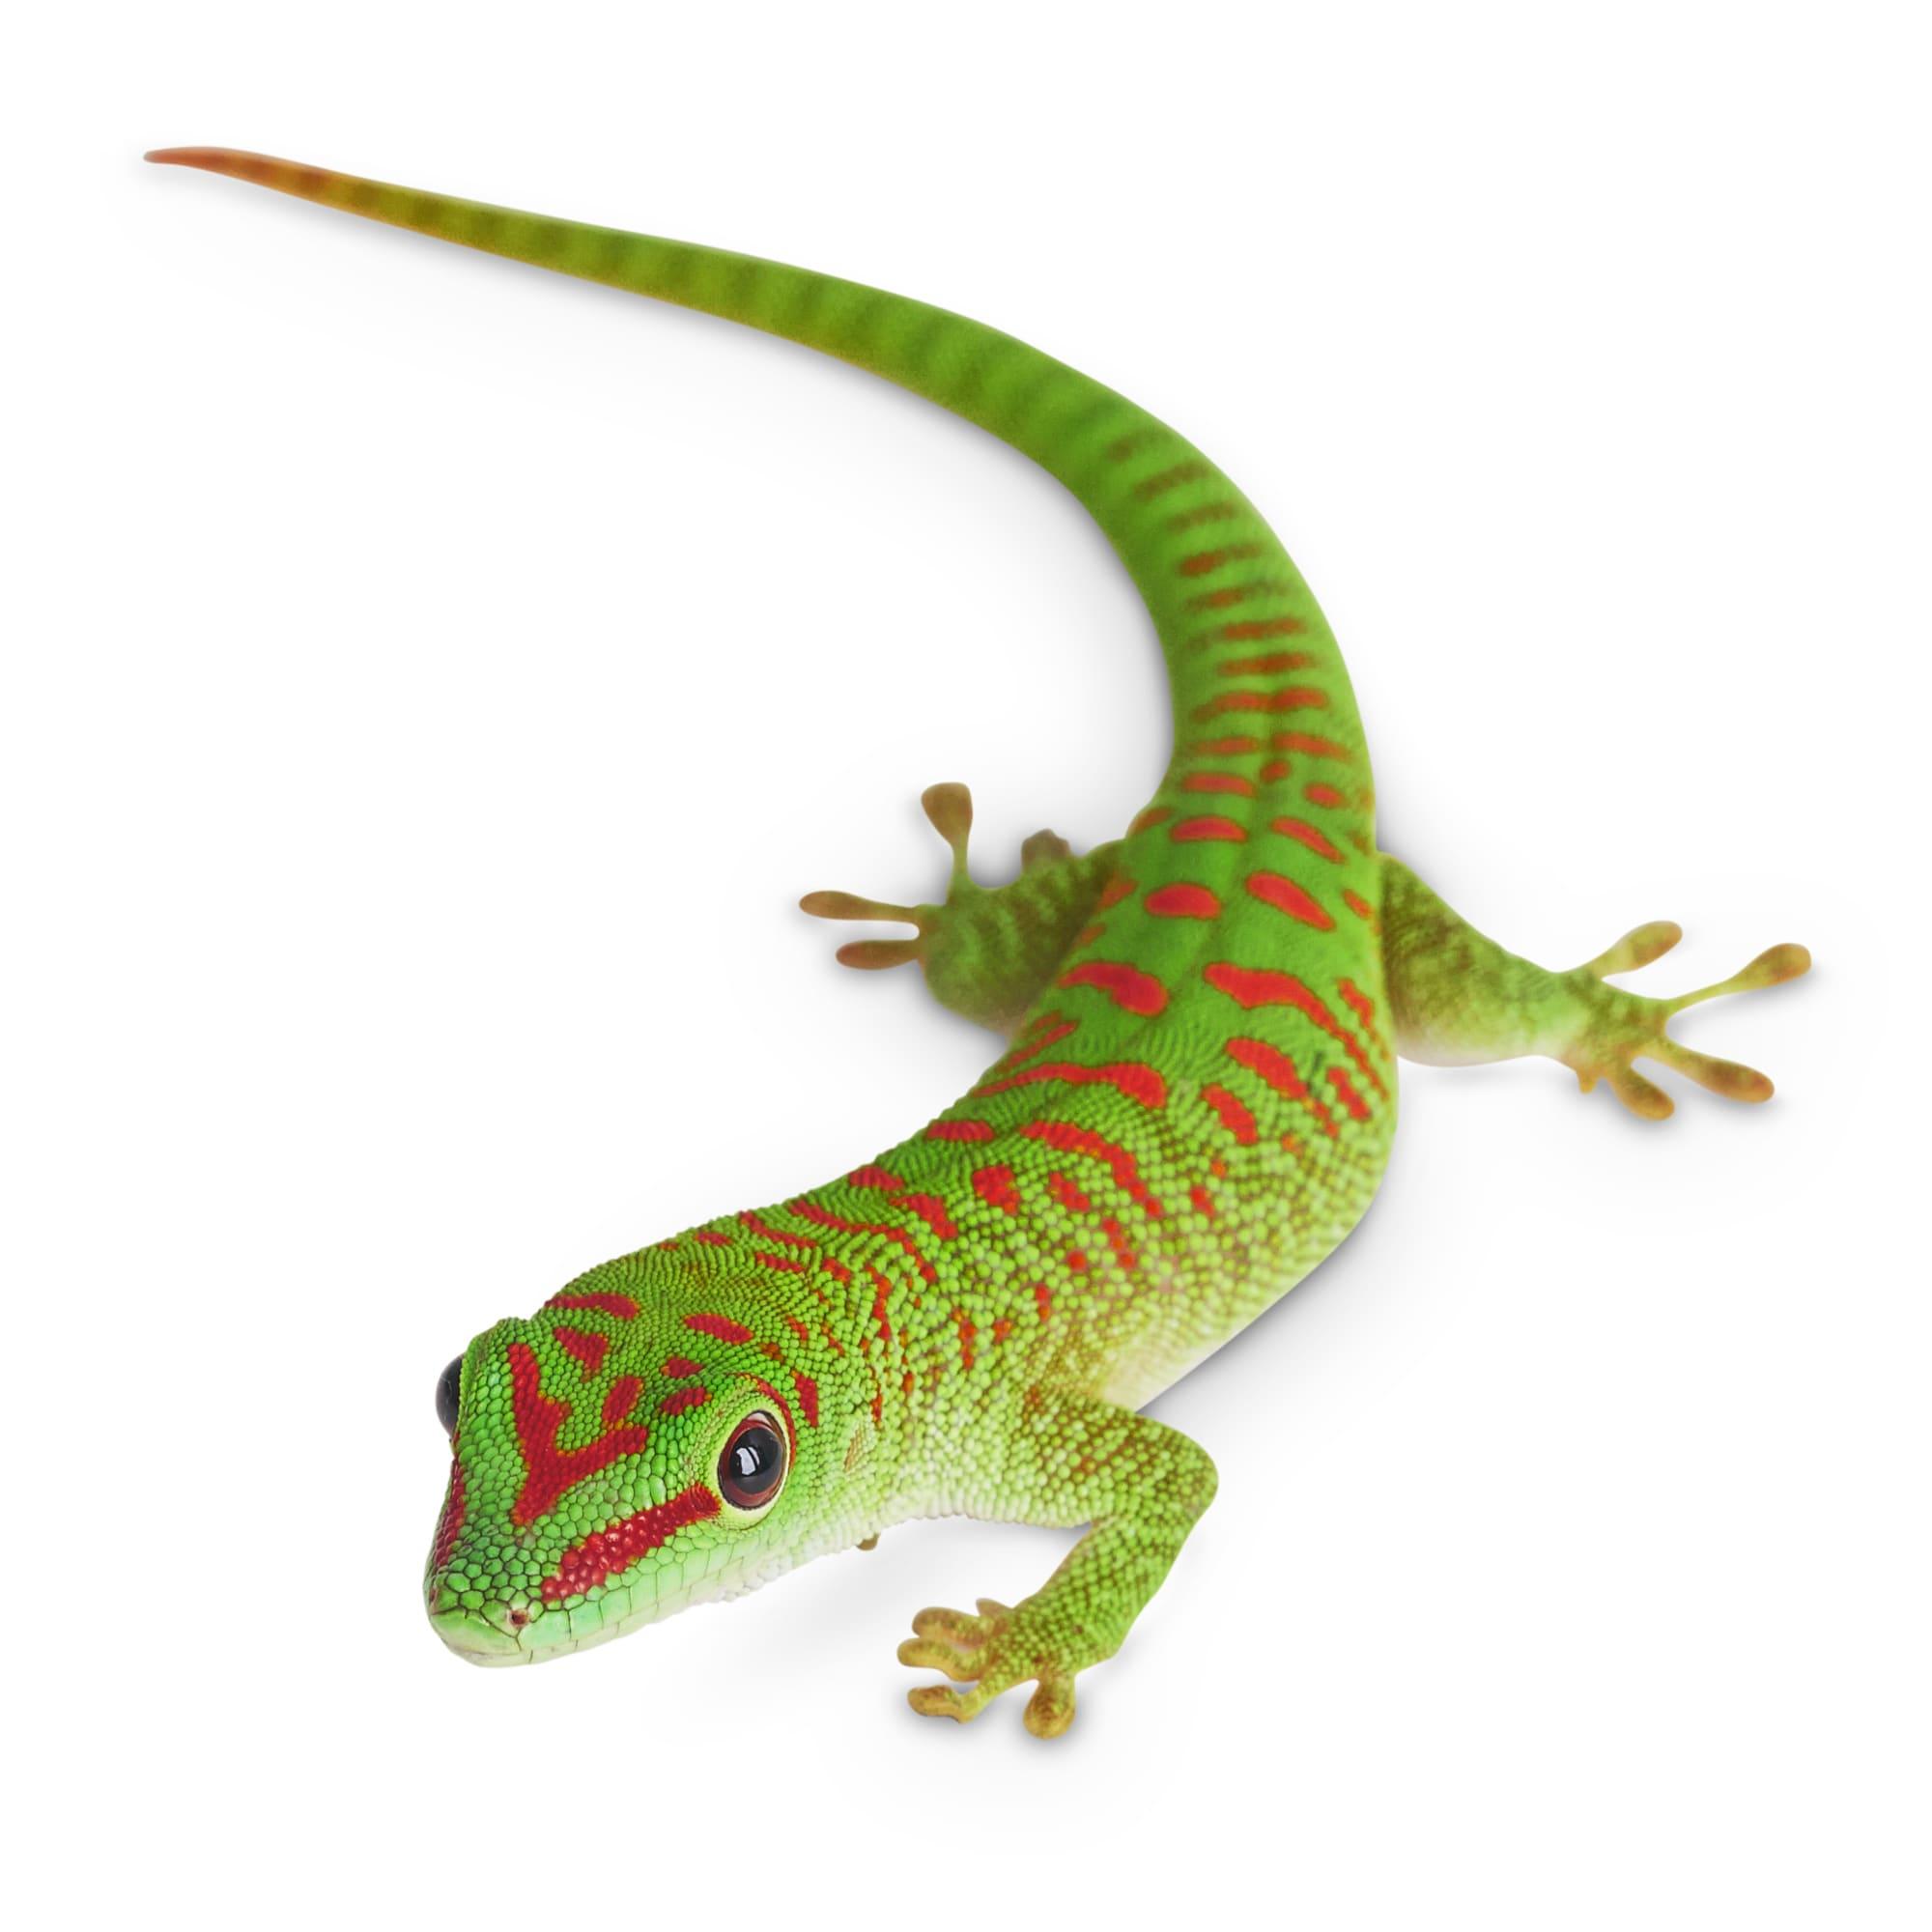 Giant Day Geckos For Sale Phelsuma Sp Petco